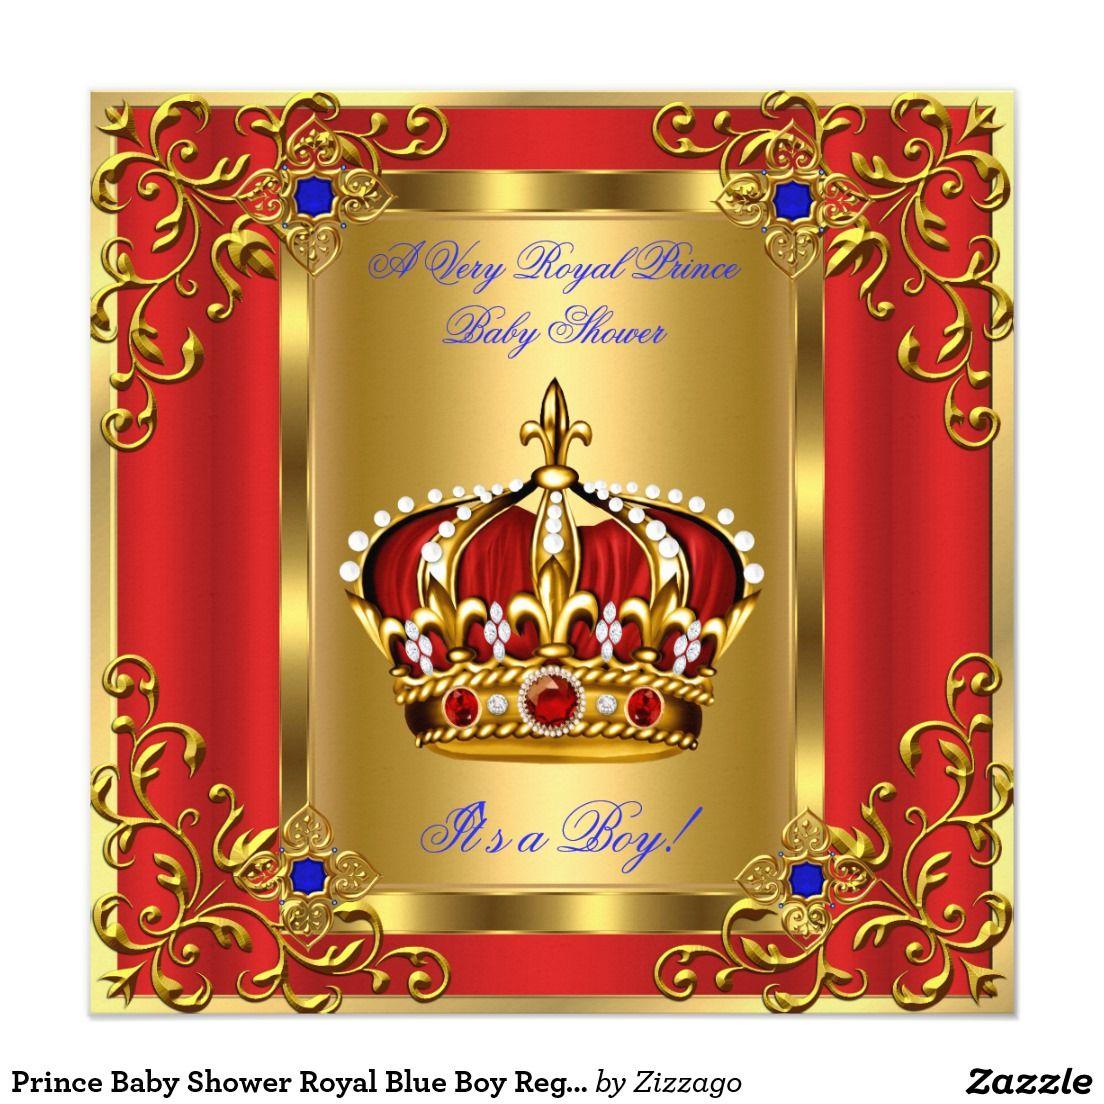 Prince Baby Shower Royal Blue Boy Regal Red Gold Invitation ...